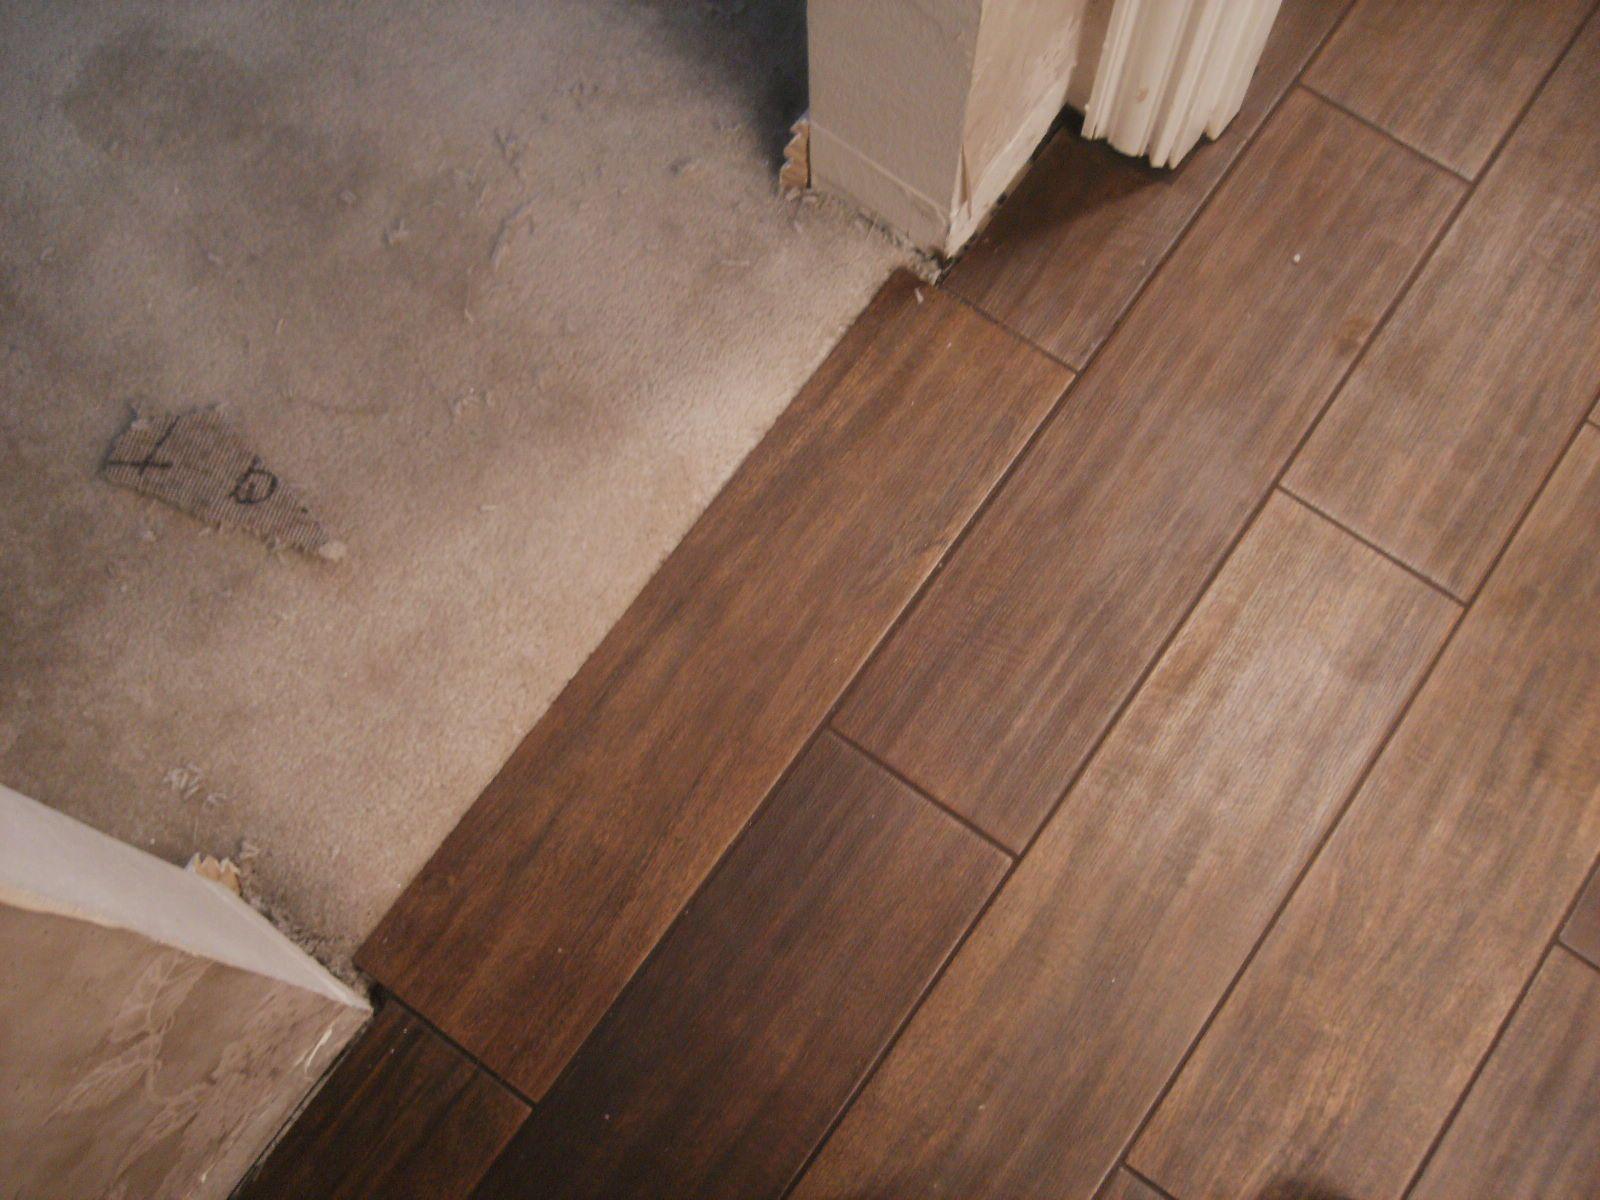 Bathroom With Wood Tile Floor Wood Look Tile Floor Wood Like